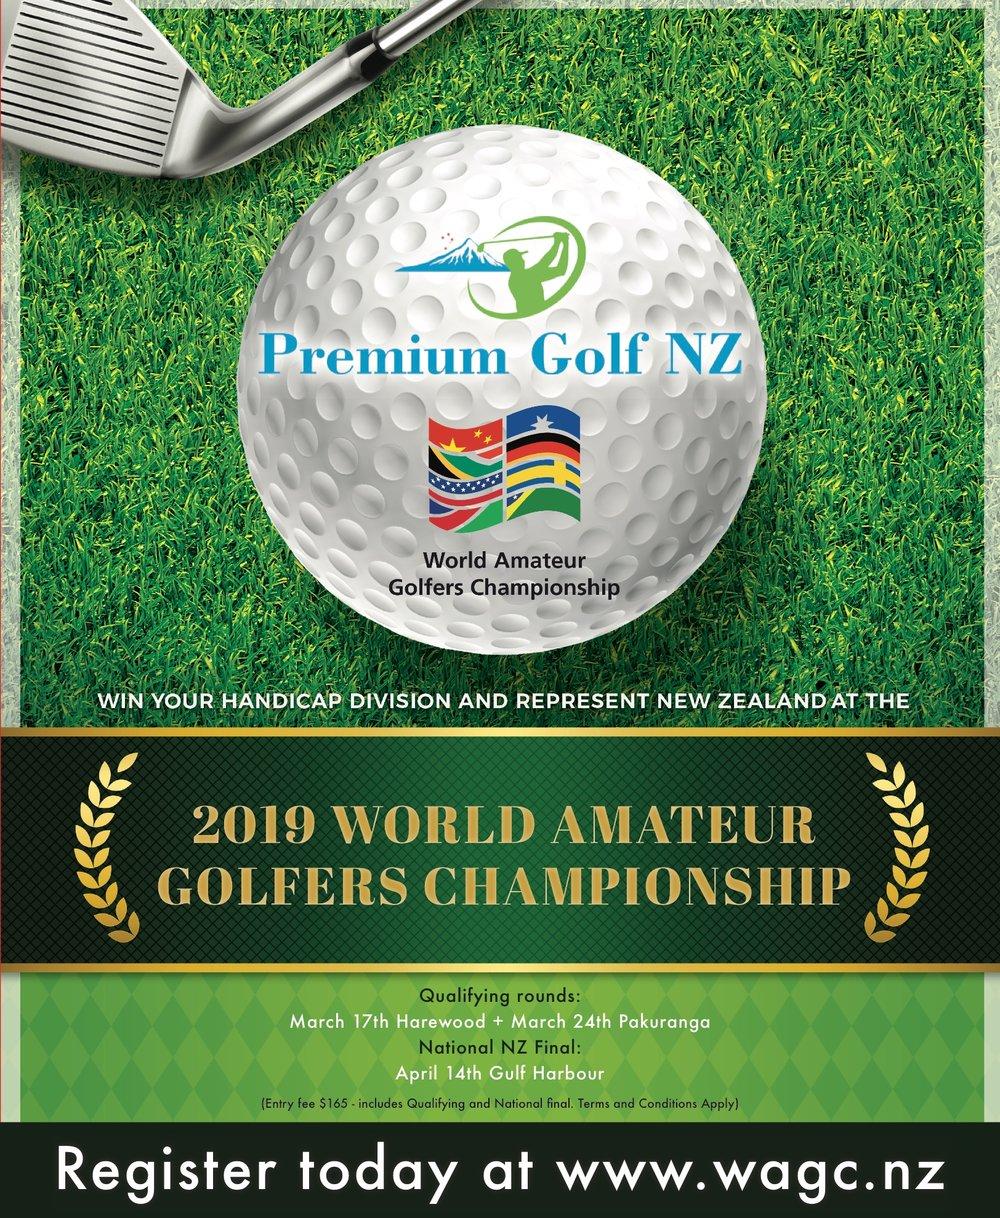 Premium Golf FULL PAGE 201901.jpg